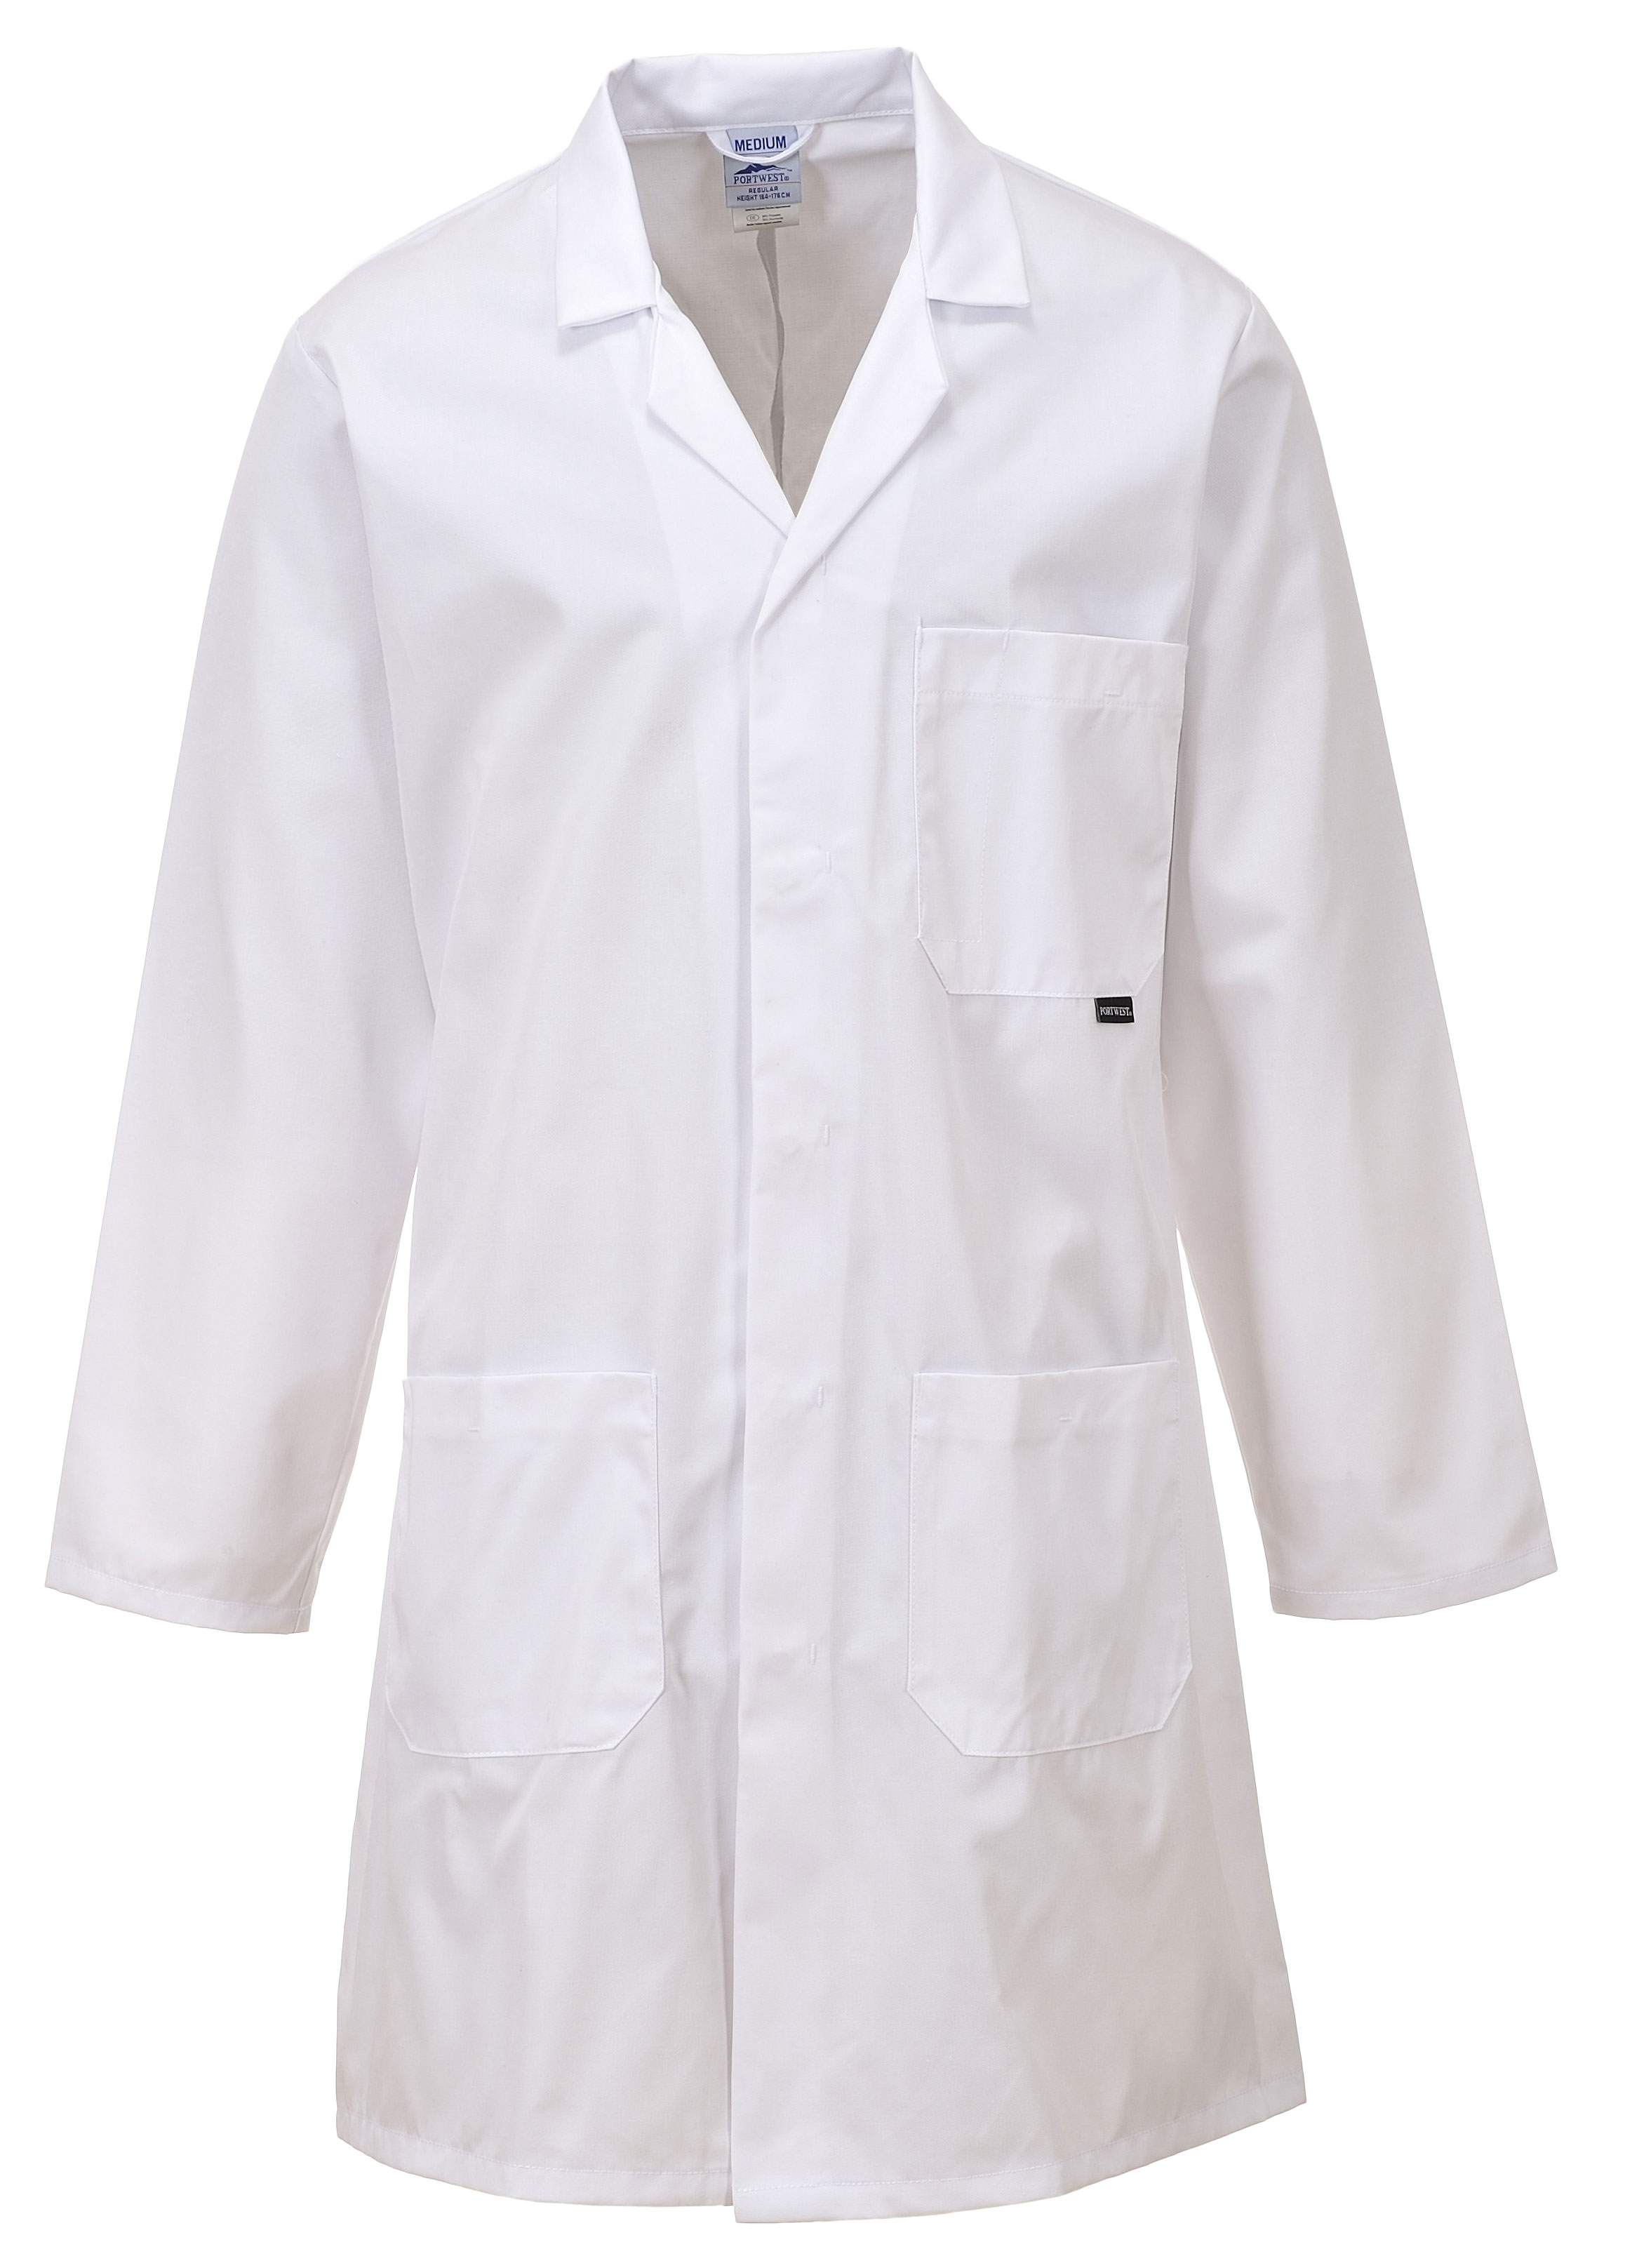 Northrock Safety Laboratory Coat Laboratory Coat